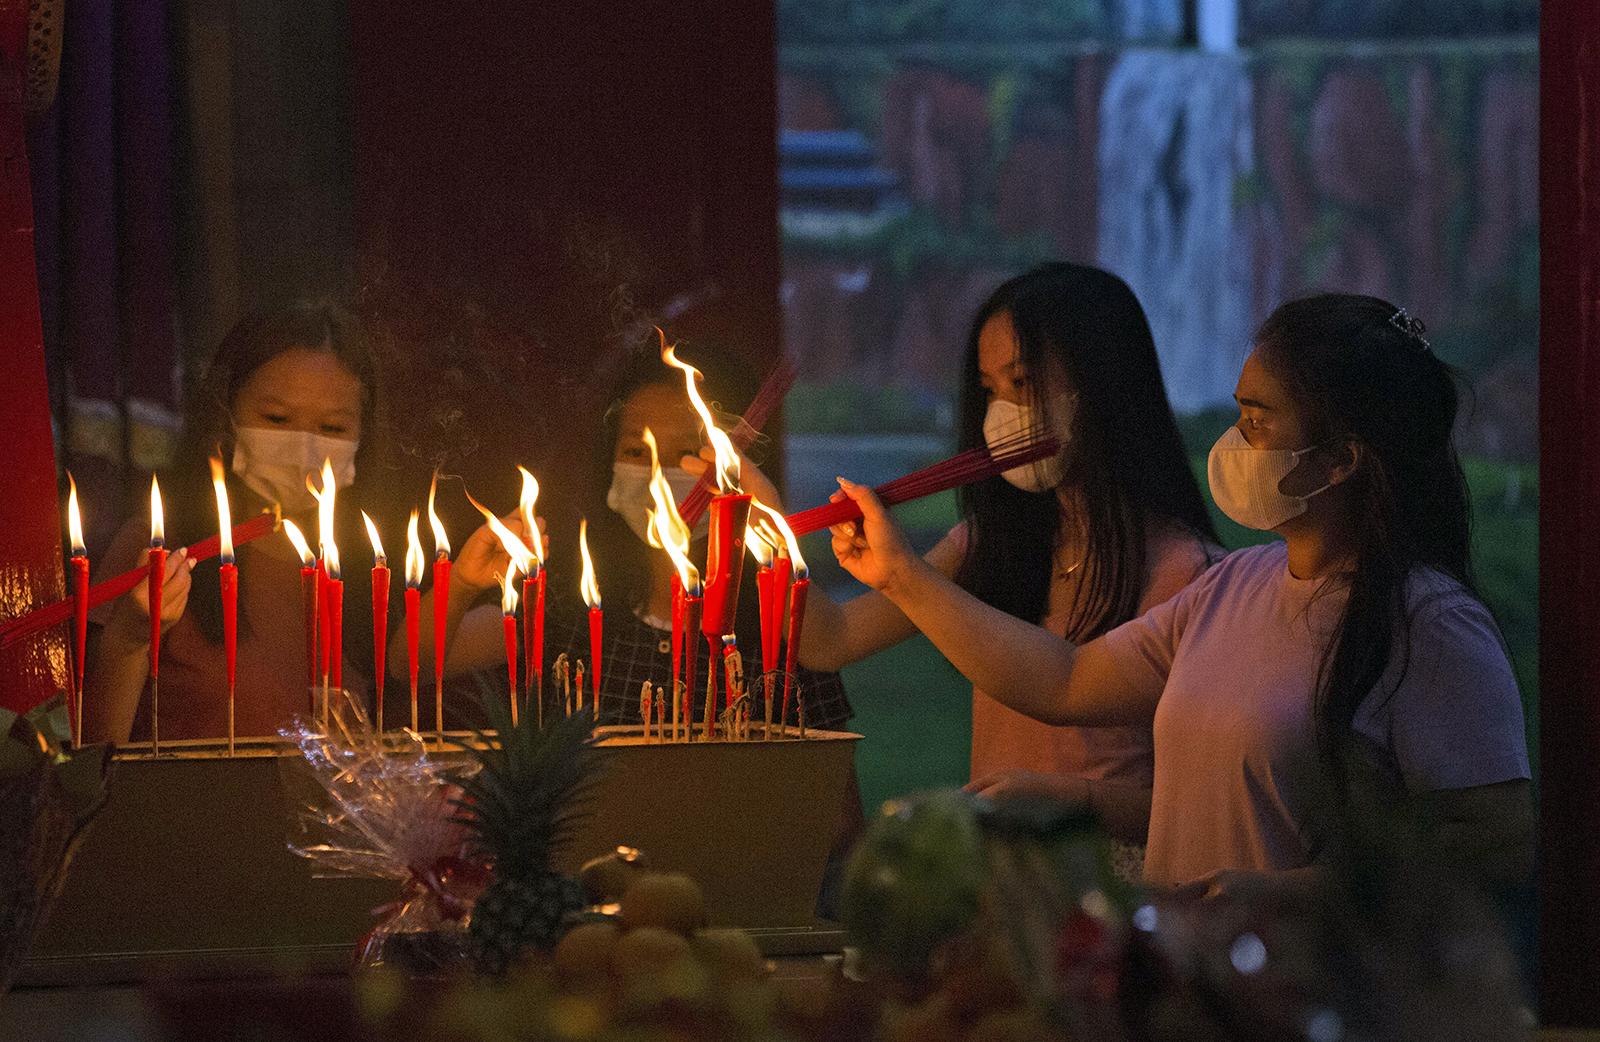 Ethnic Chinese worshippers light joss sticks during Lunar New Year's Eve celebrations at a temple in Medan, North Sumatra, Indonesia, late Thursday, Friday, Feb. 12, 2021. (AP Photo/Binsar Bakkara)